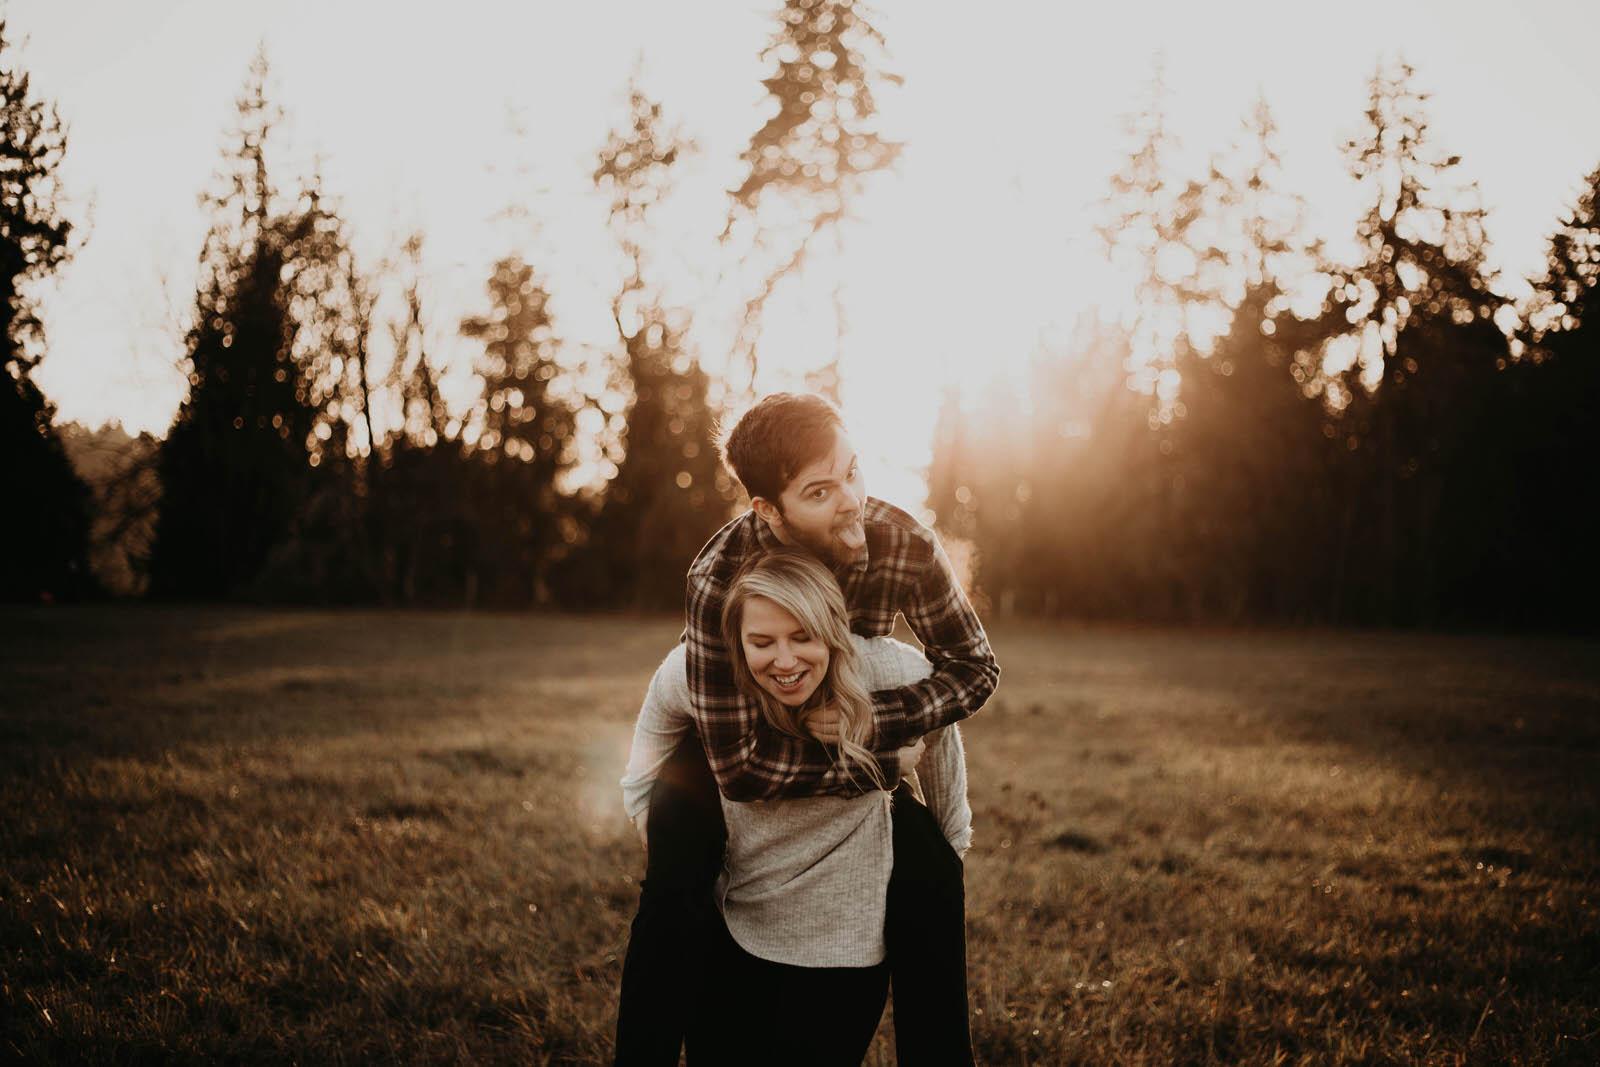 kayla-tallon-jamiecarle-couples-session-portland-9728.jpg